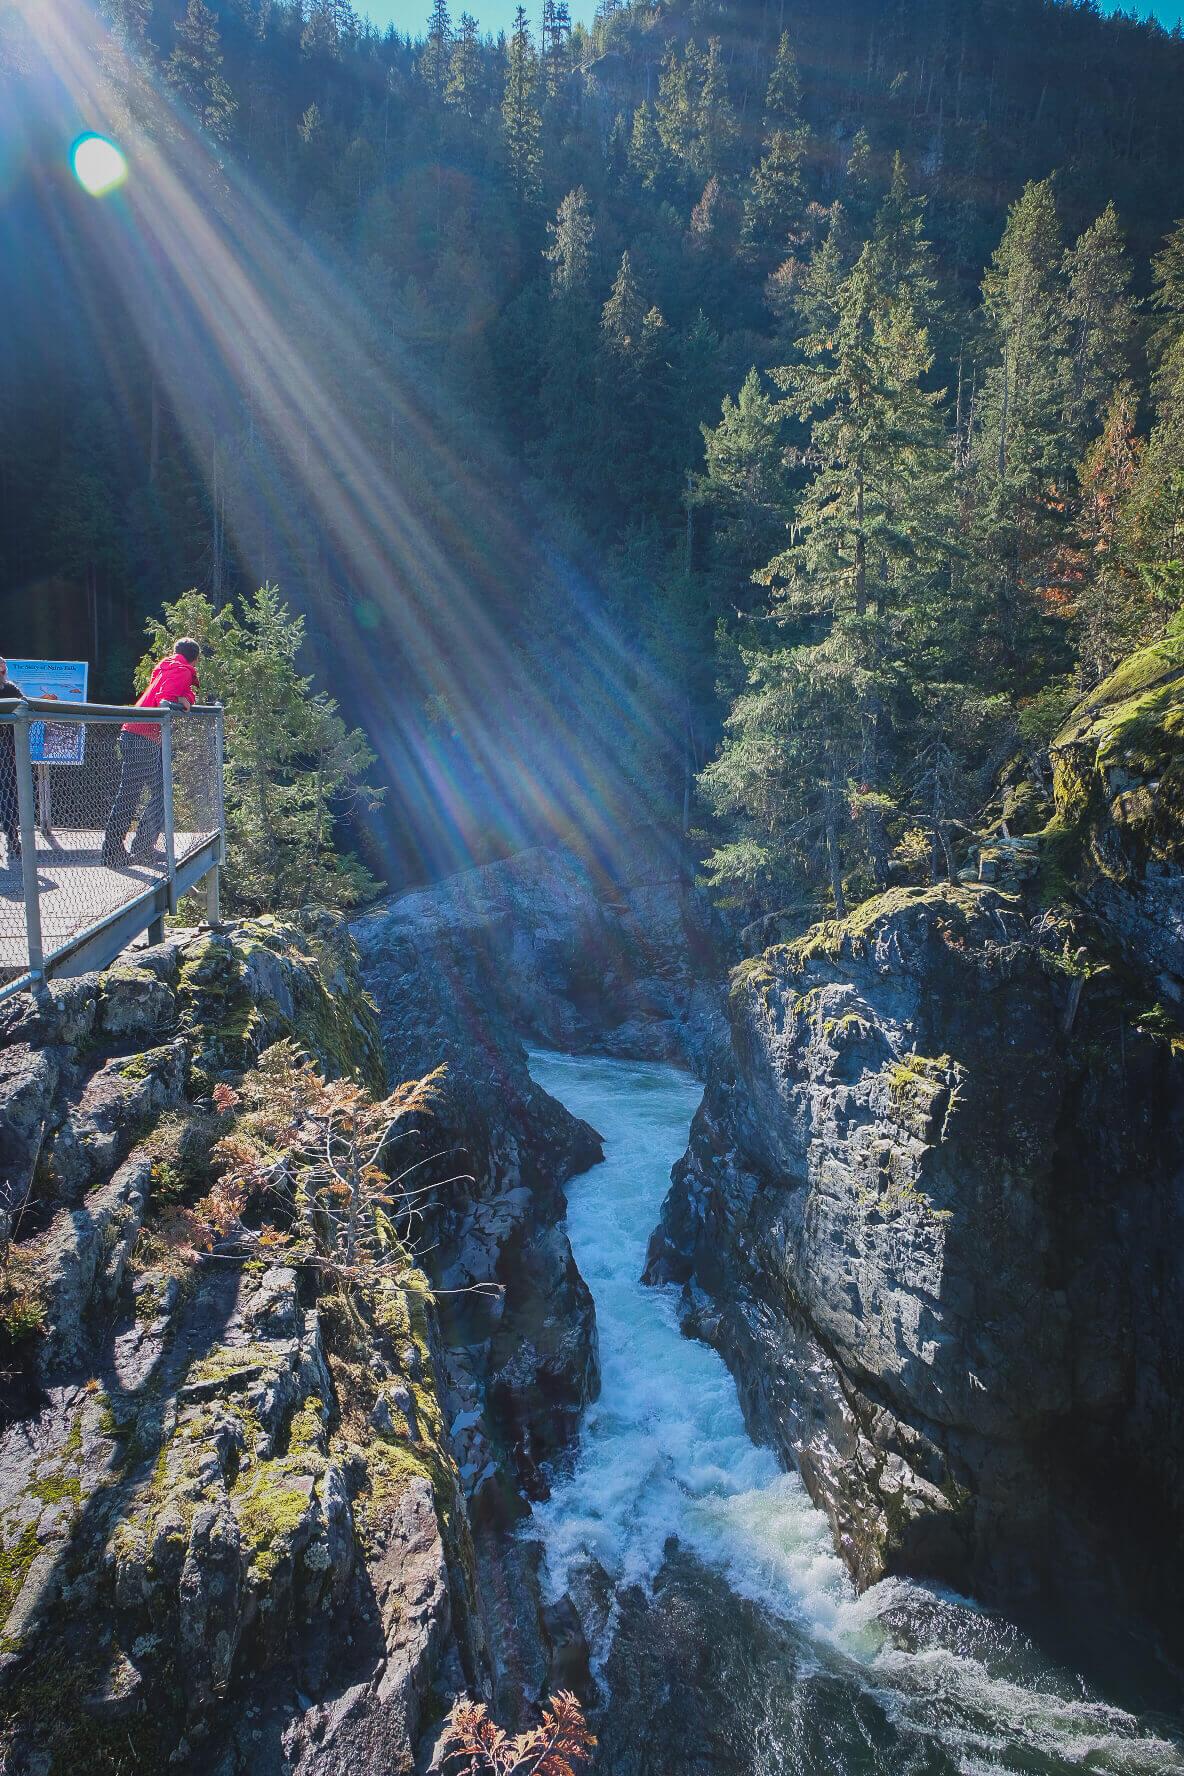 Nairn Falls, Waterfalls of British Columbia